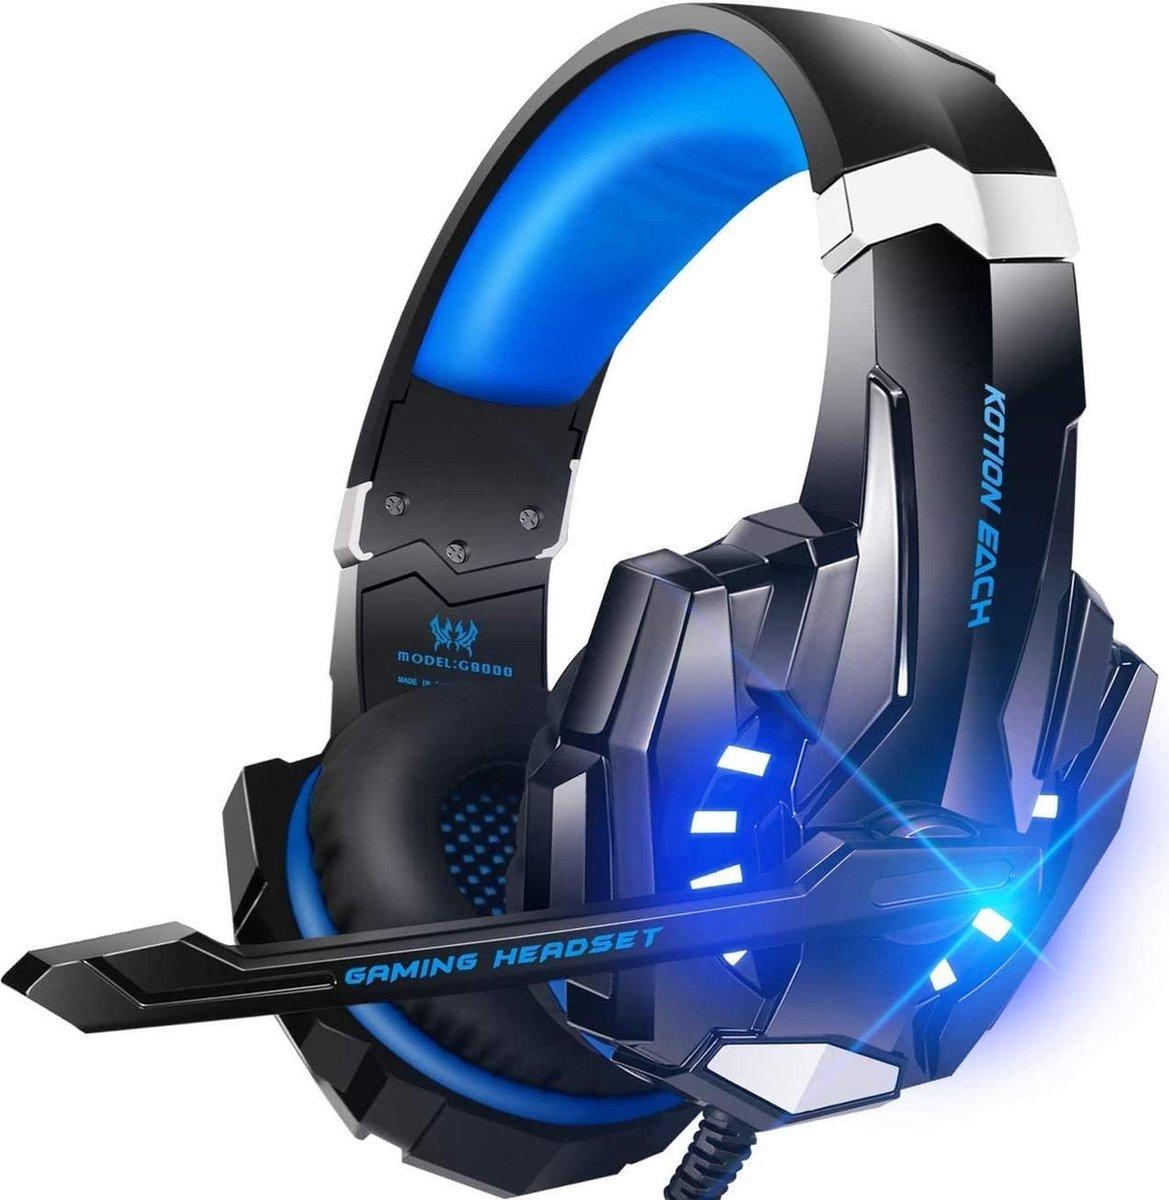 KOTION EACH G Gaming Headset - Zwart/Blauw - Geschikt voor PS4, Xbox One, Switch & Windows